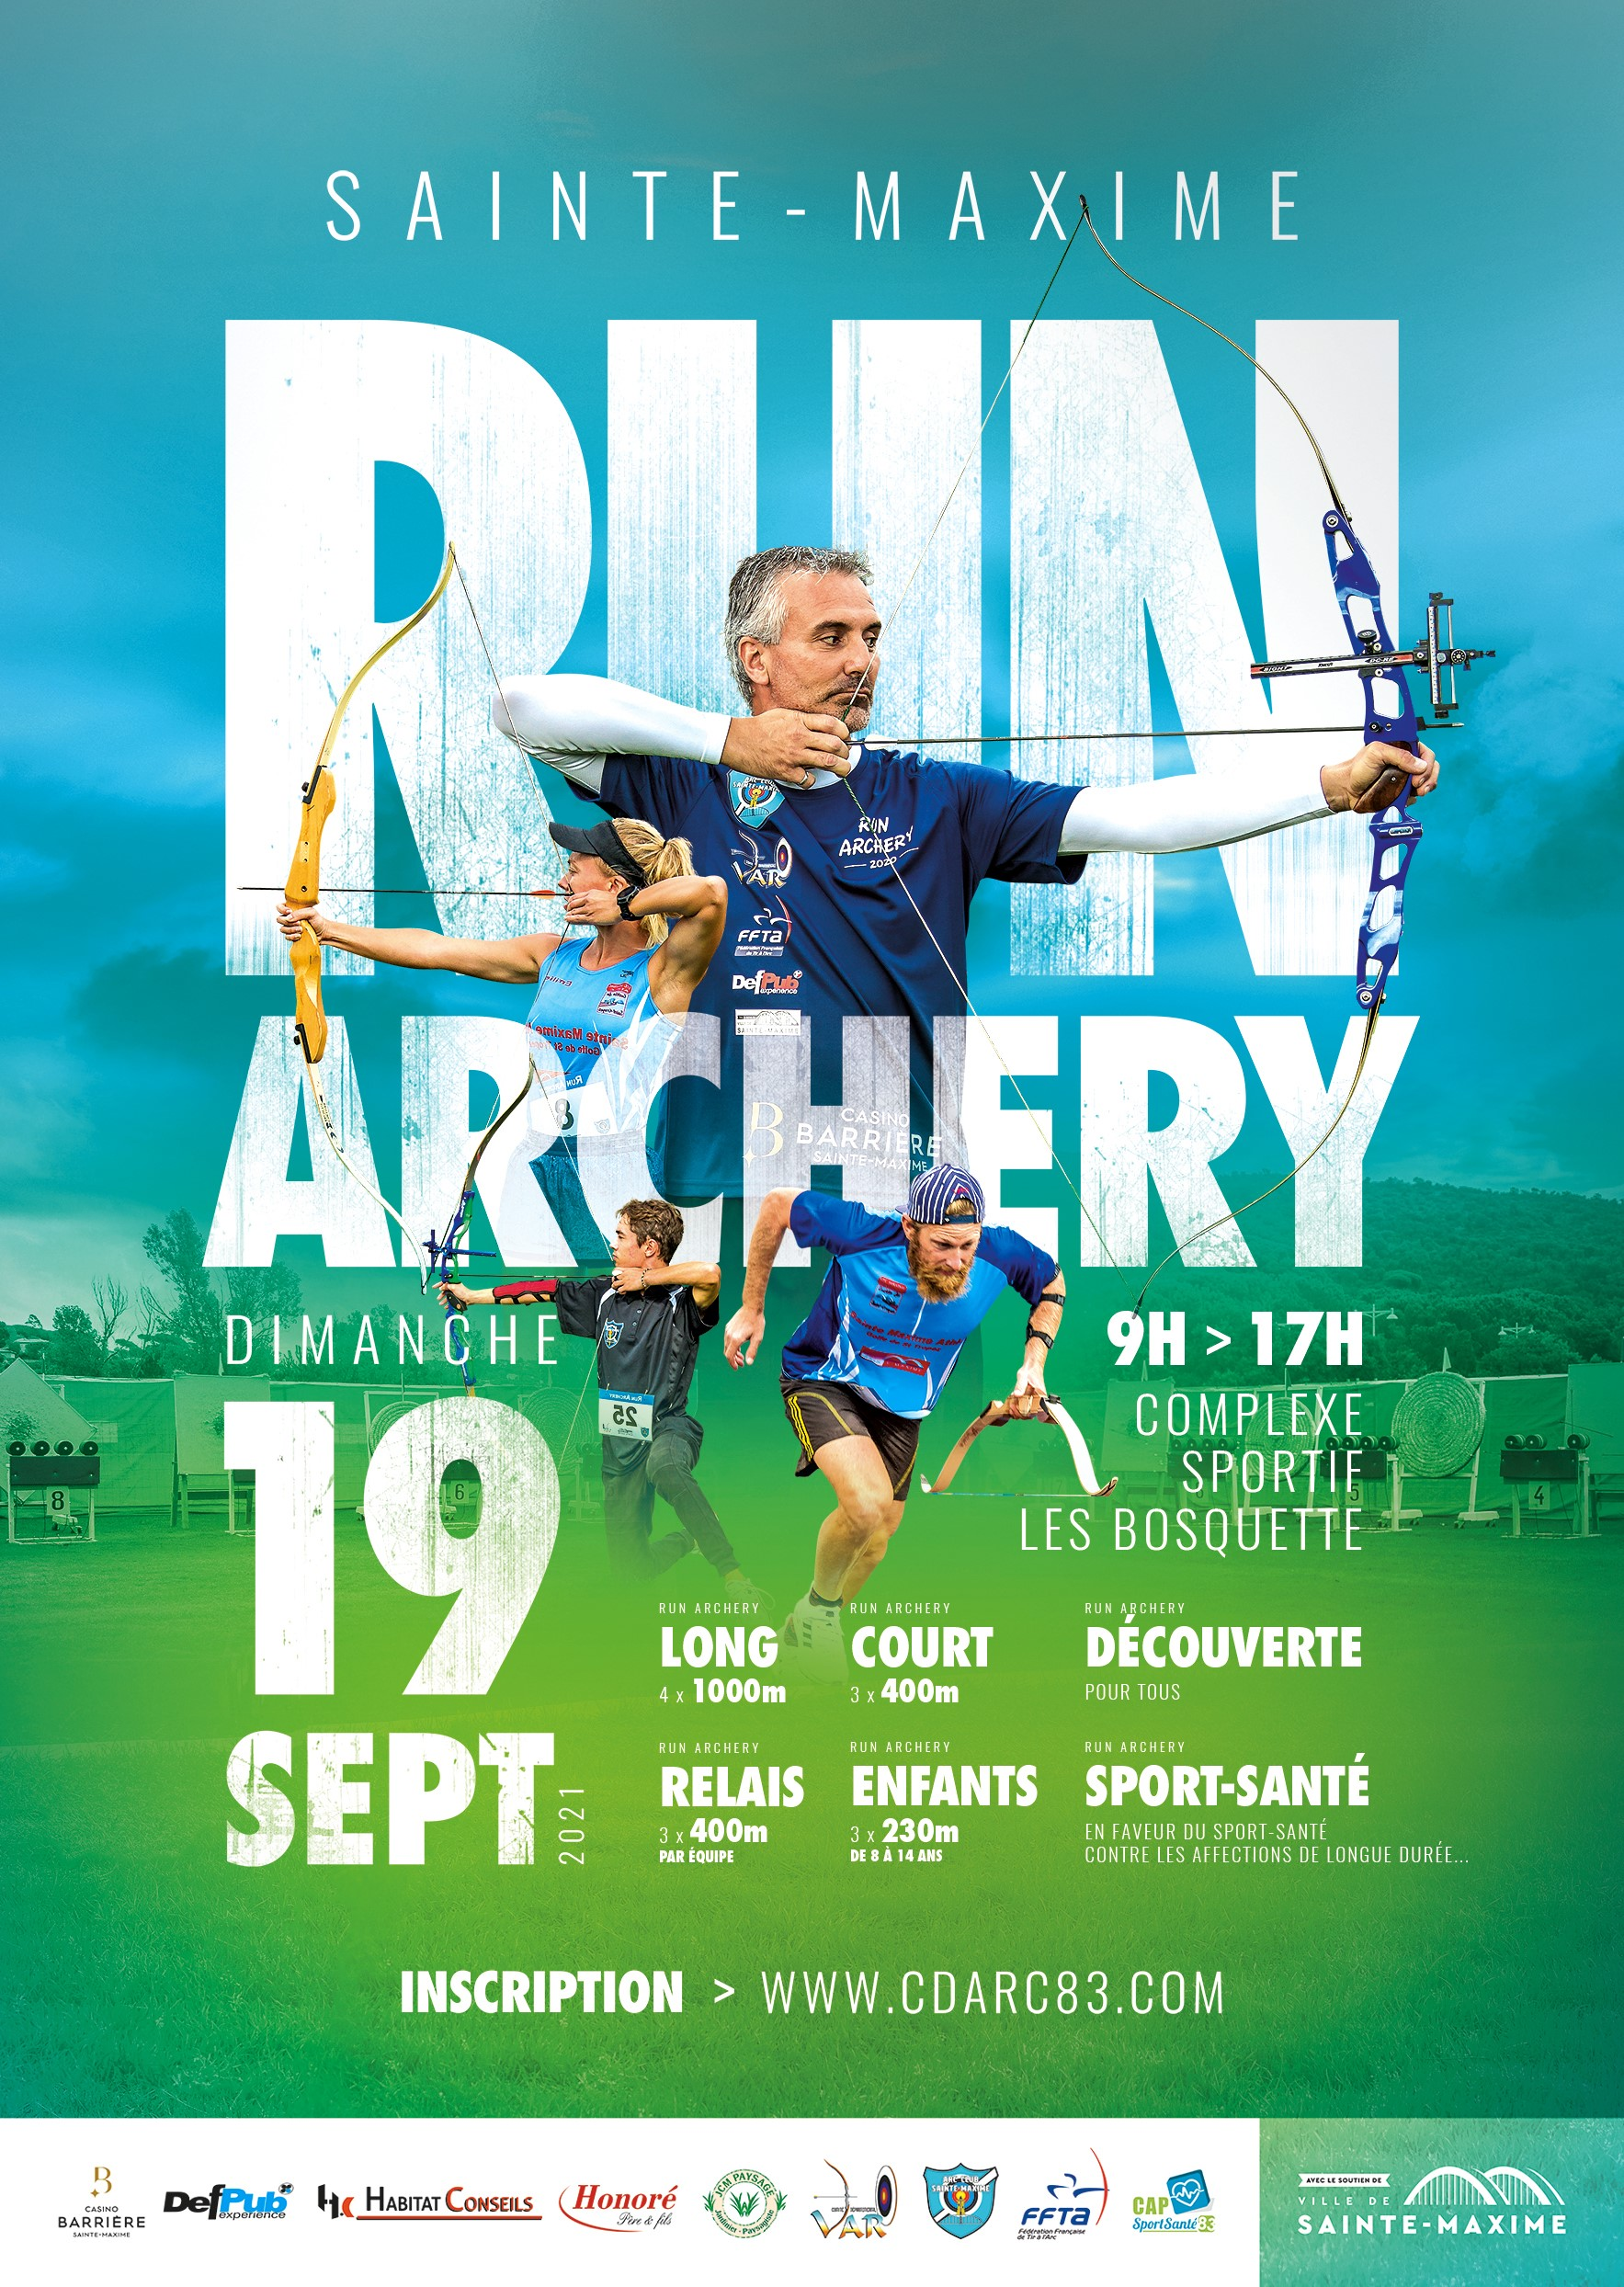 Run archery 2